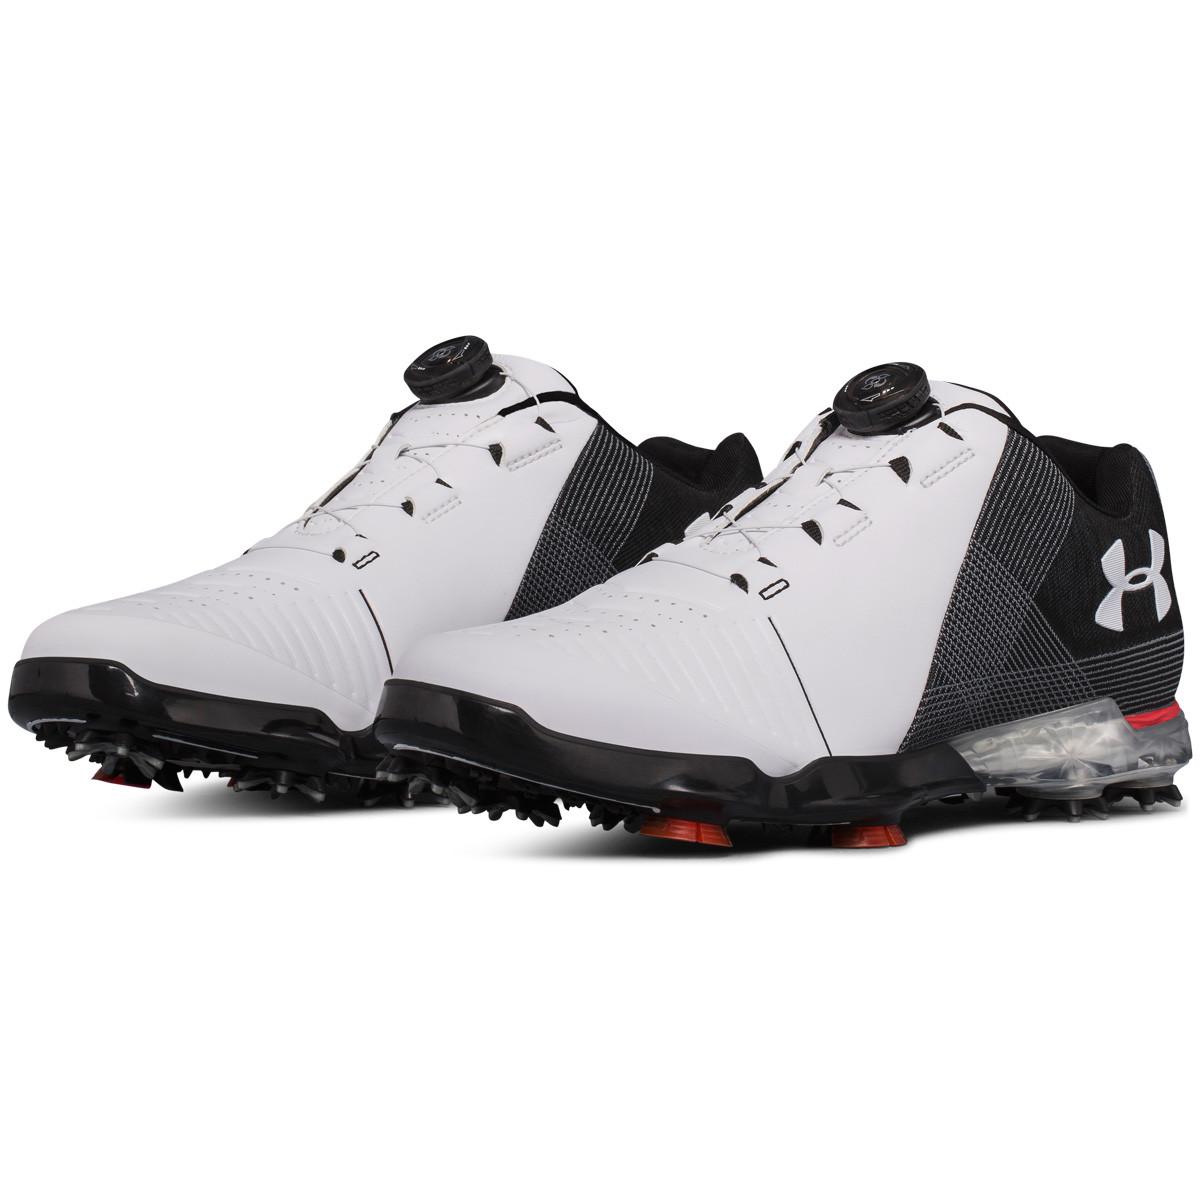 ff90ad05bb0 Under Armour Mens UA Spieth 2 BOA Waterproof Golf Shoes